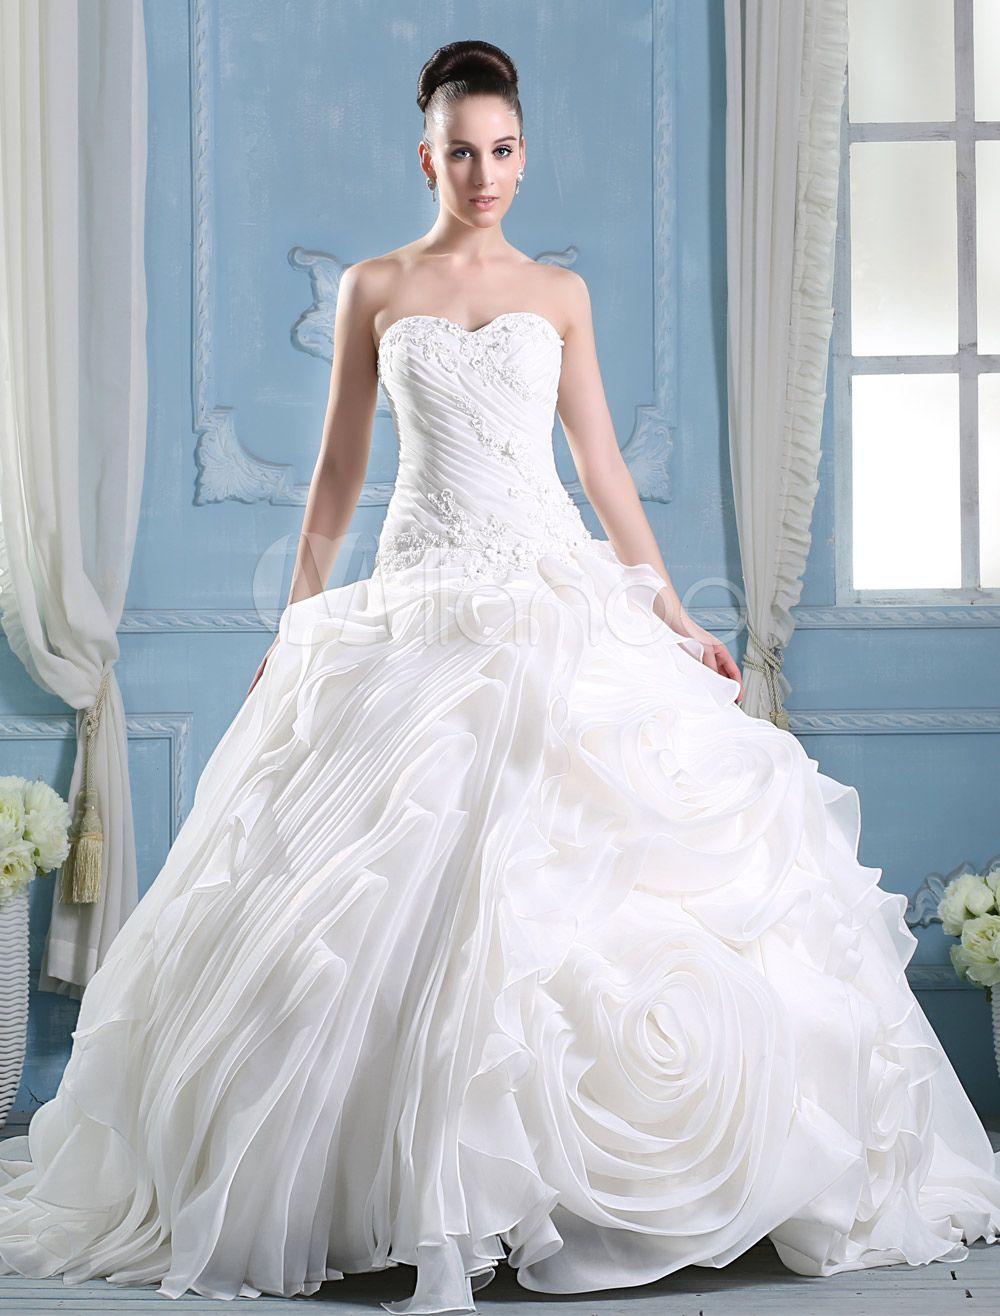 Ivory Sweetheart Neck Aline Strapless Flower Wedding Dress